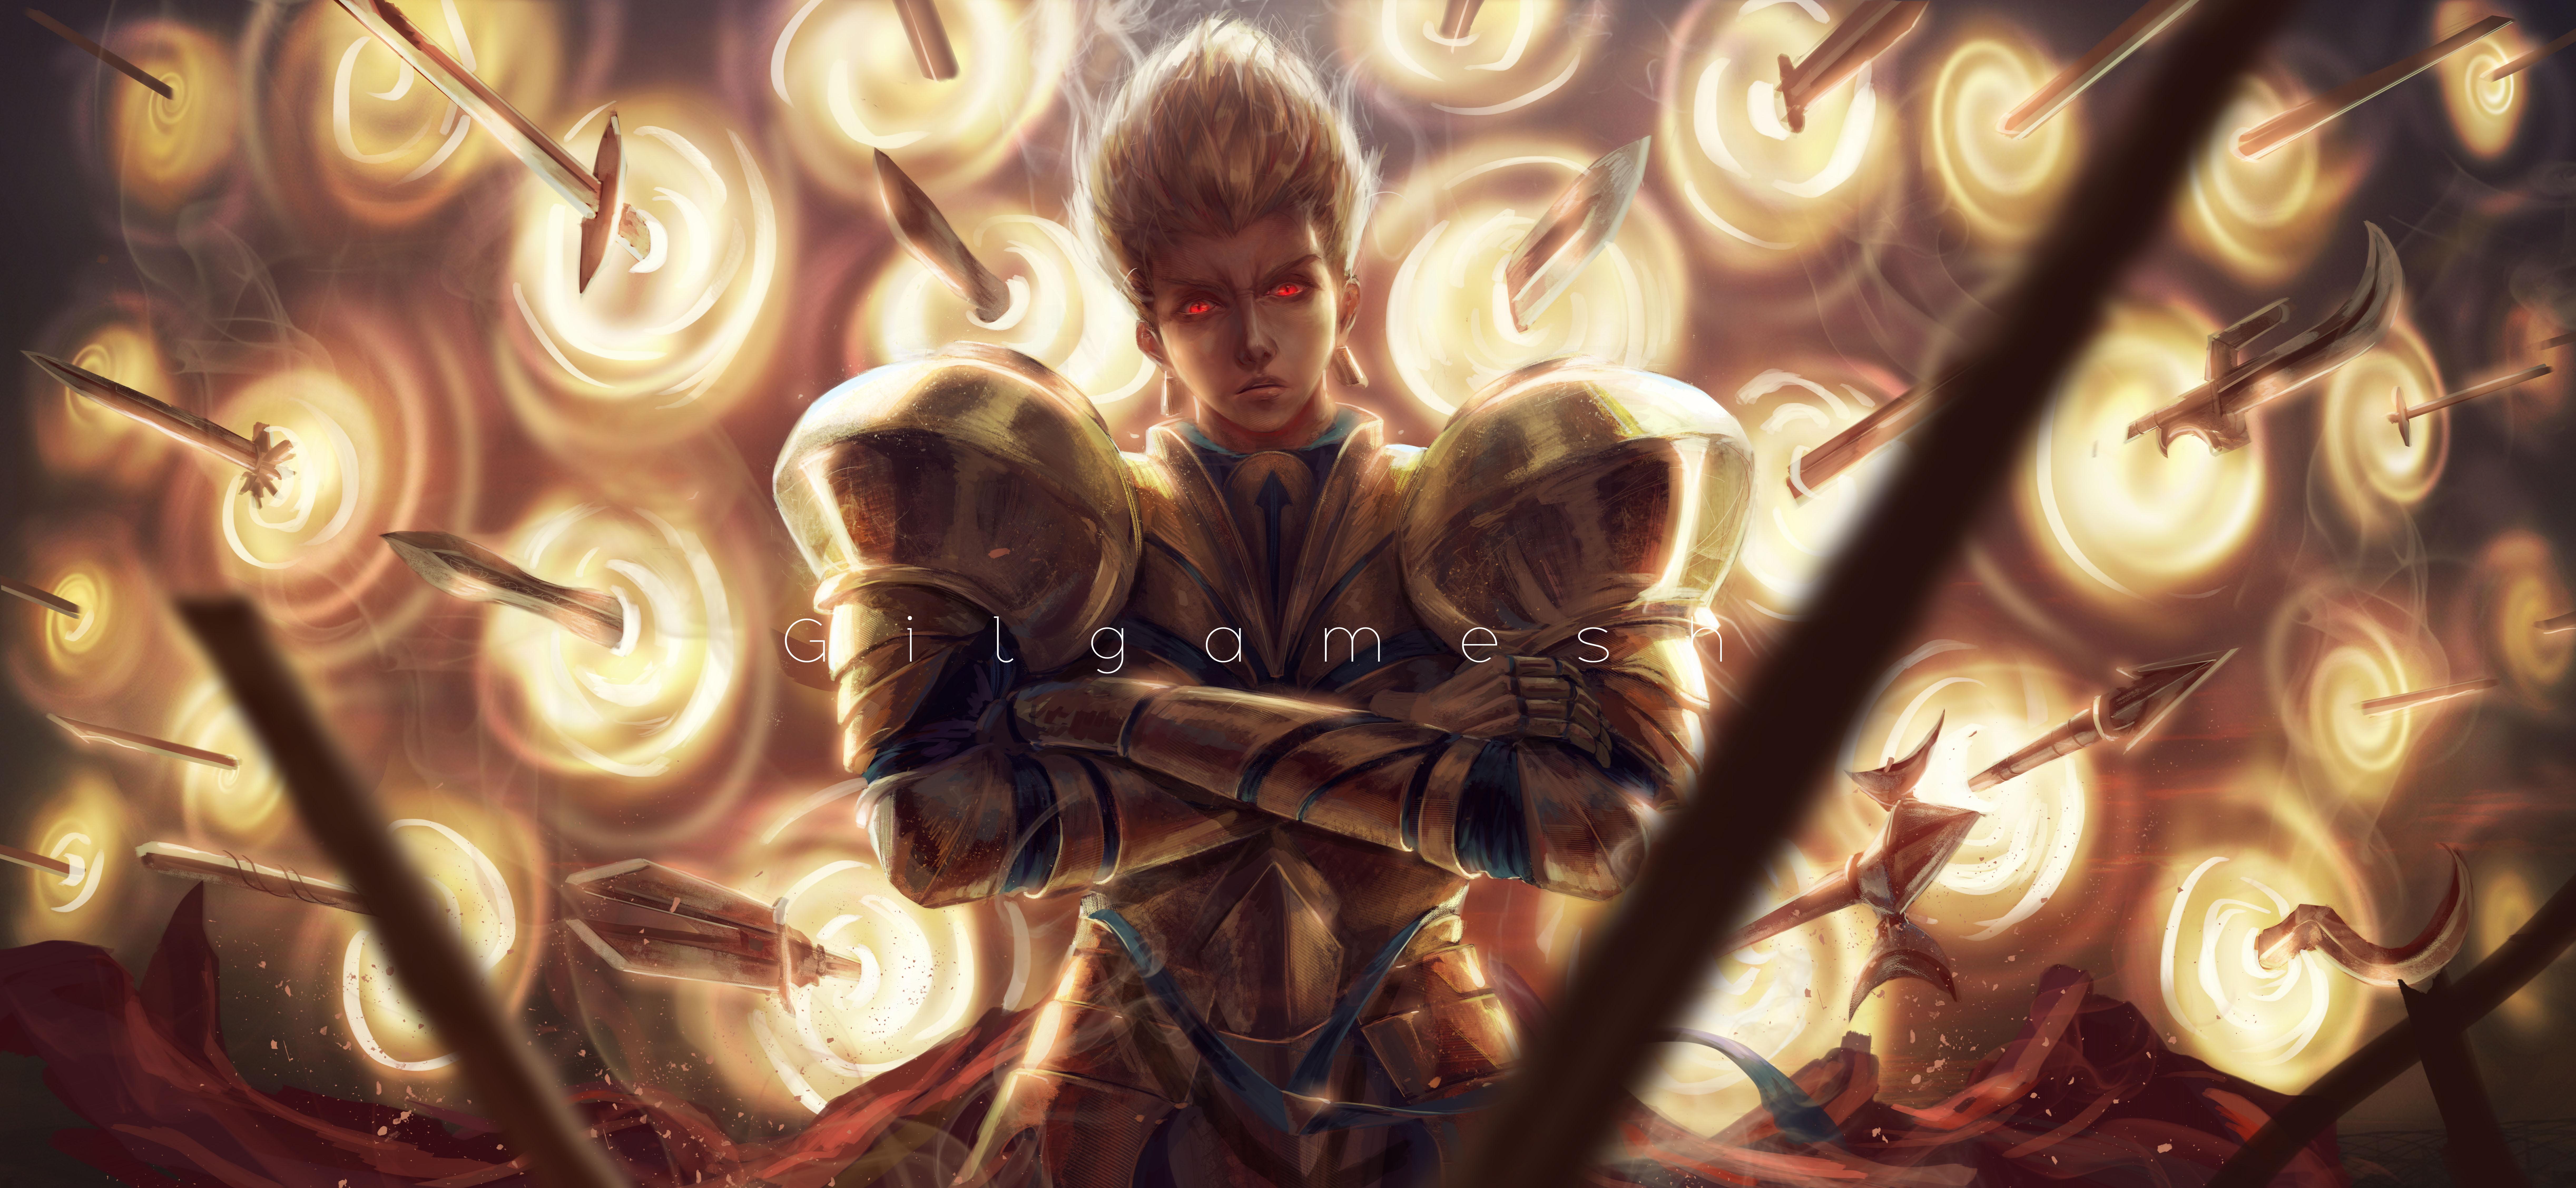 Gilgamesh Fate Stay Night Image 2415329 Zerochan Anime